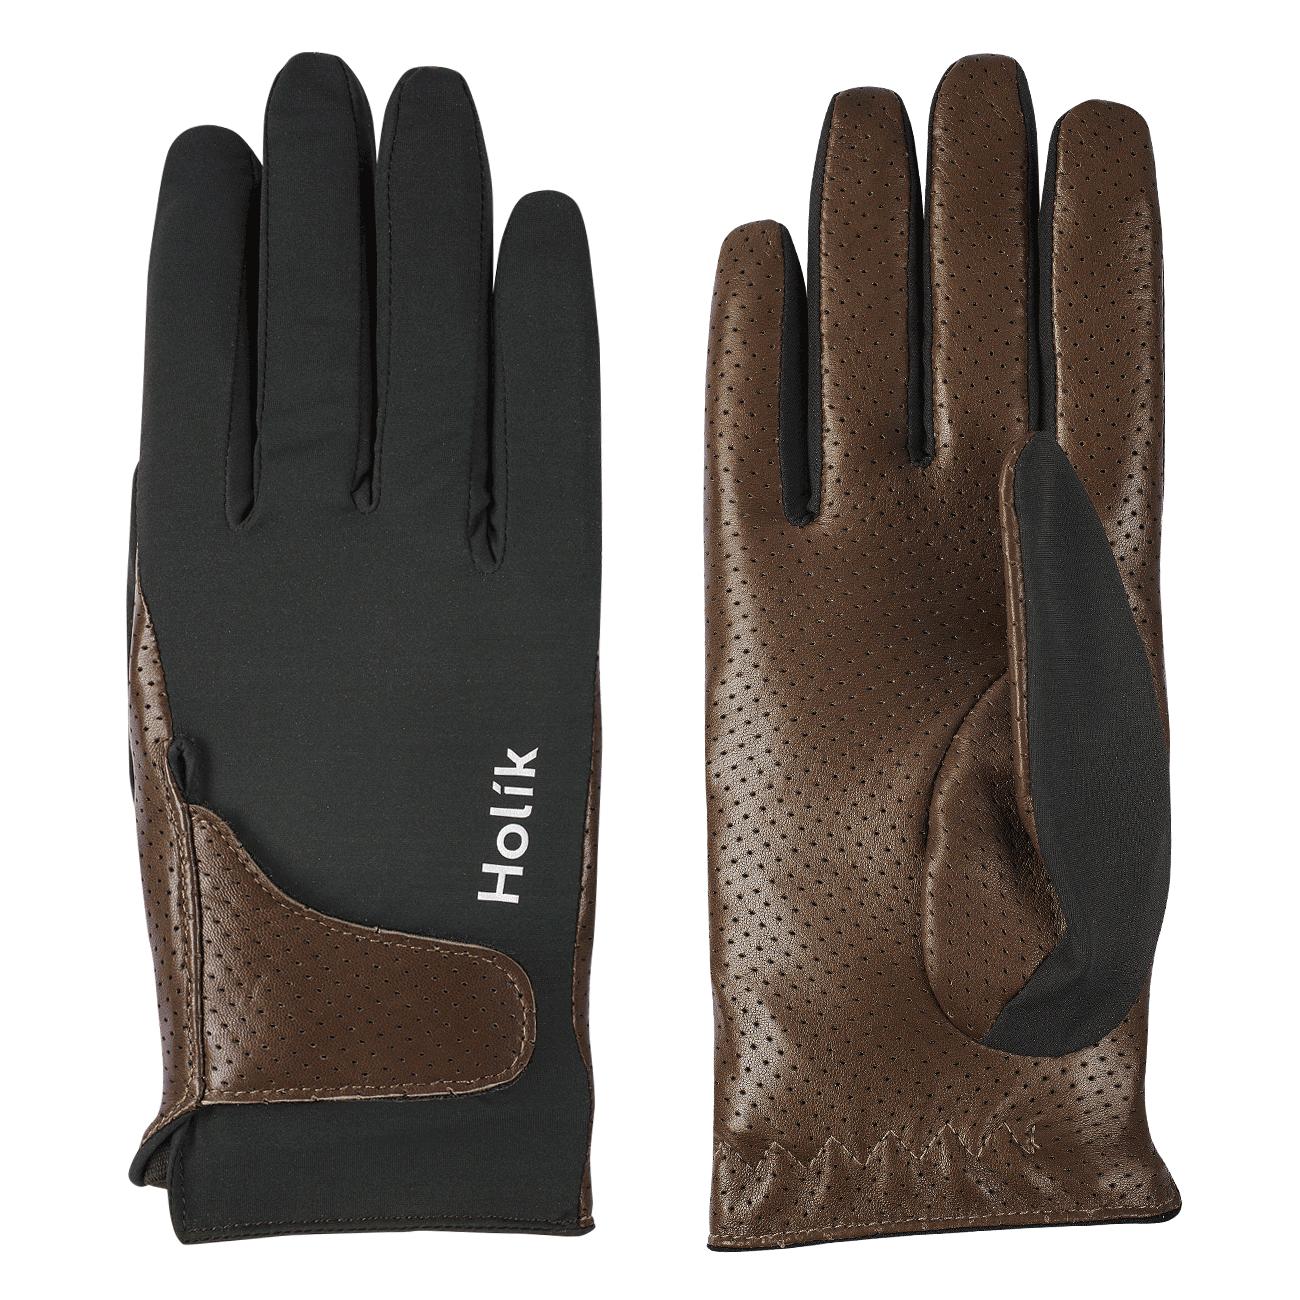 Holik Gloves Mia Fingers 8387